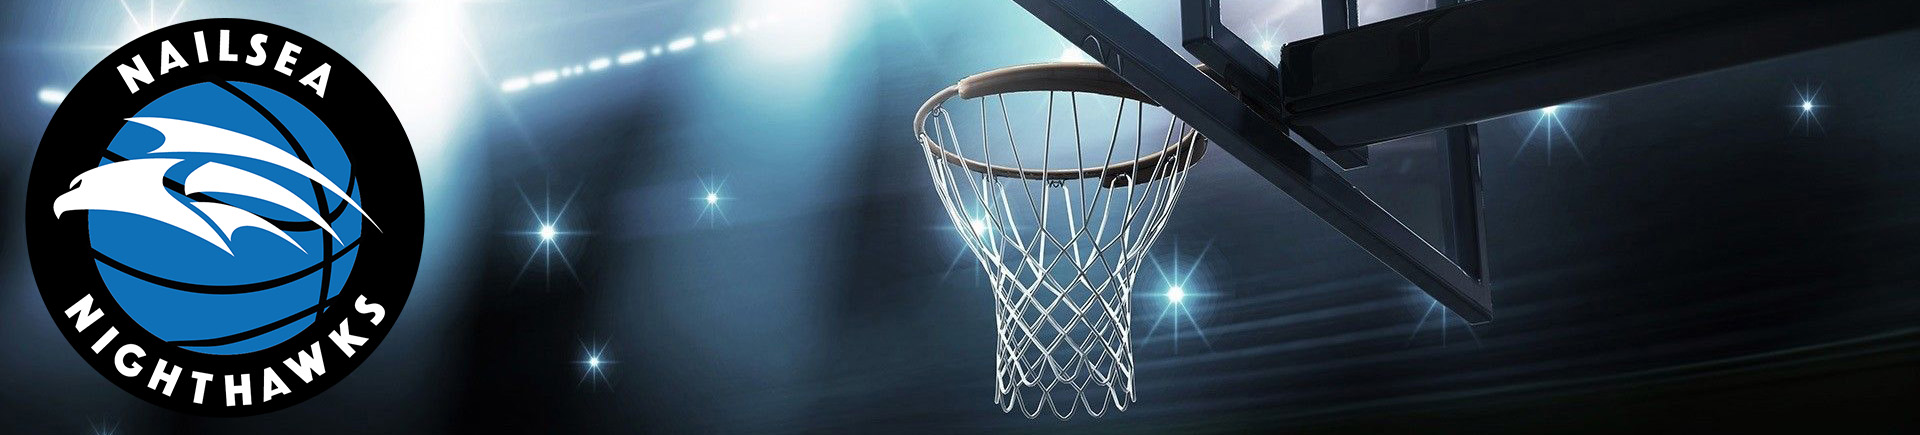 Nailsea Nighthawks Basketball